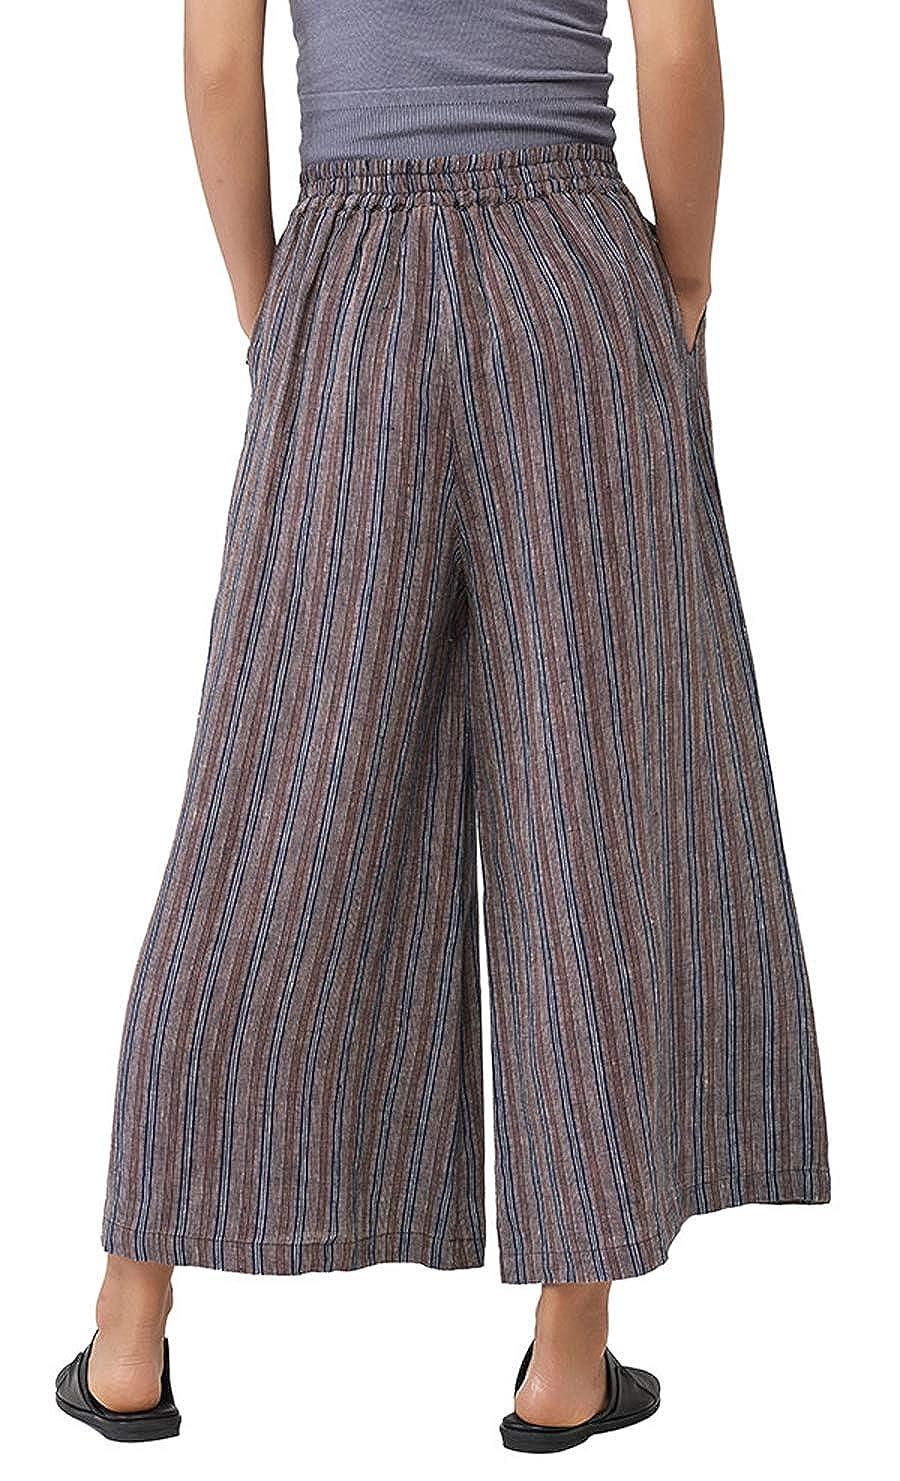 Les umes Womens Casual Loose Linen Plaid Elastic Waist Stripe Baggy Trousers Cropped Wide Leg Pants